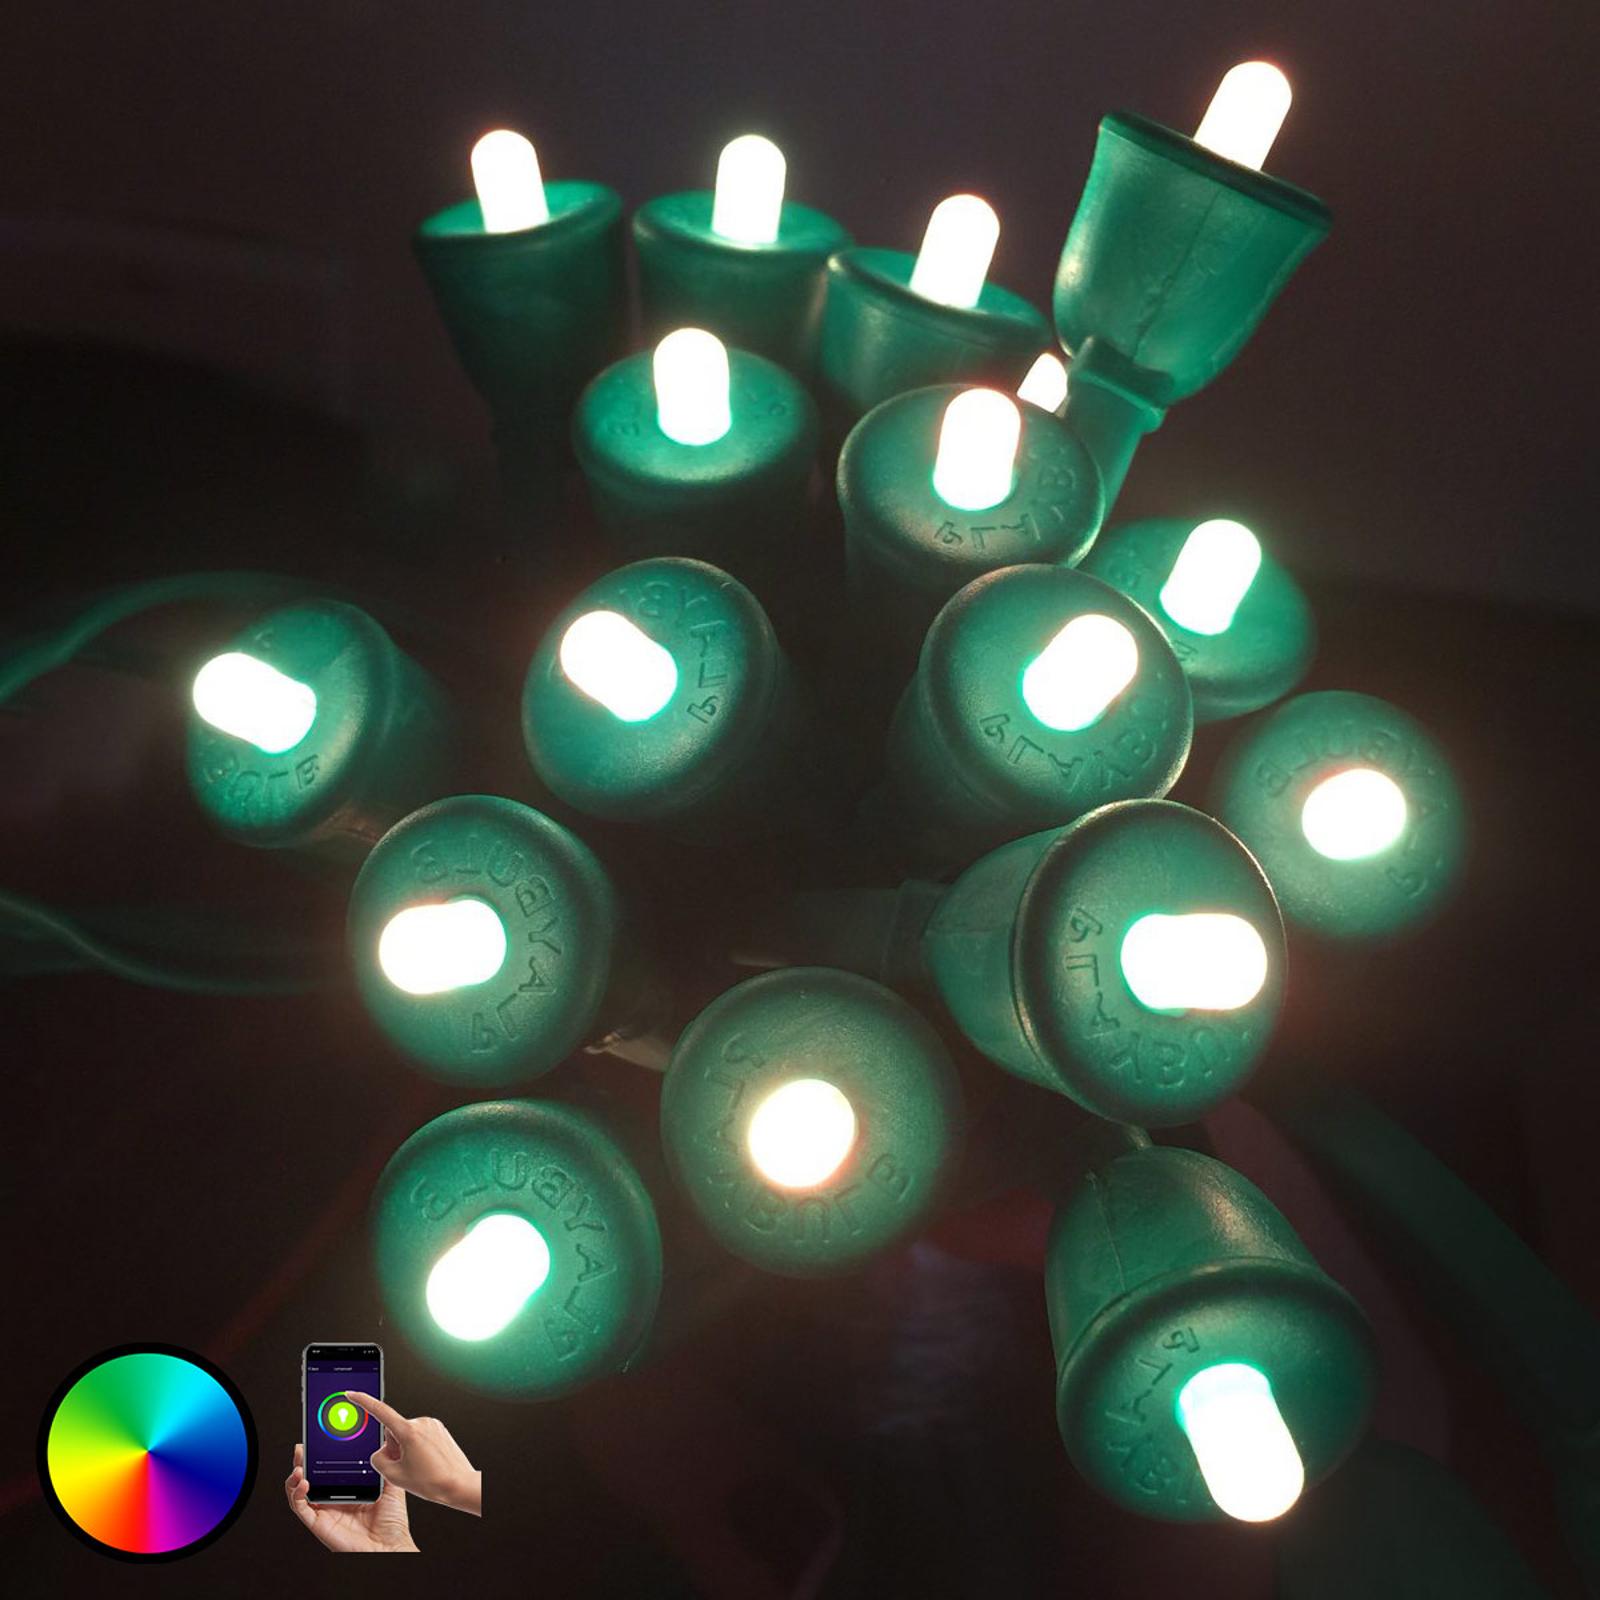 MiPow Playbulb String LED string lights 15m green_5543026_1